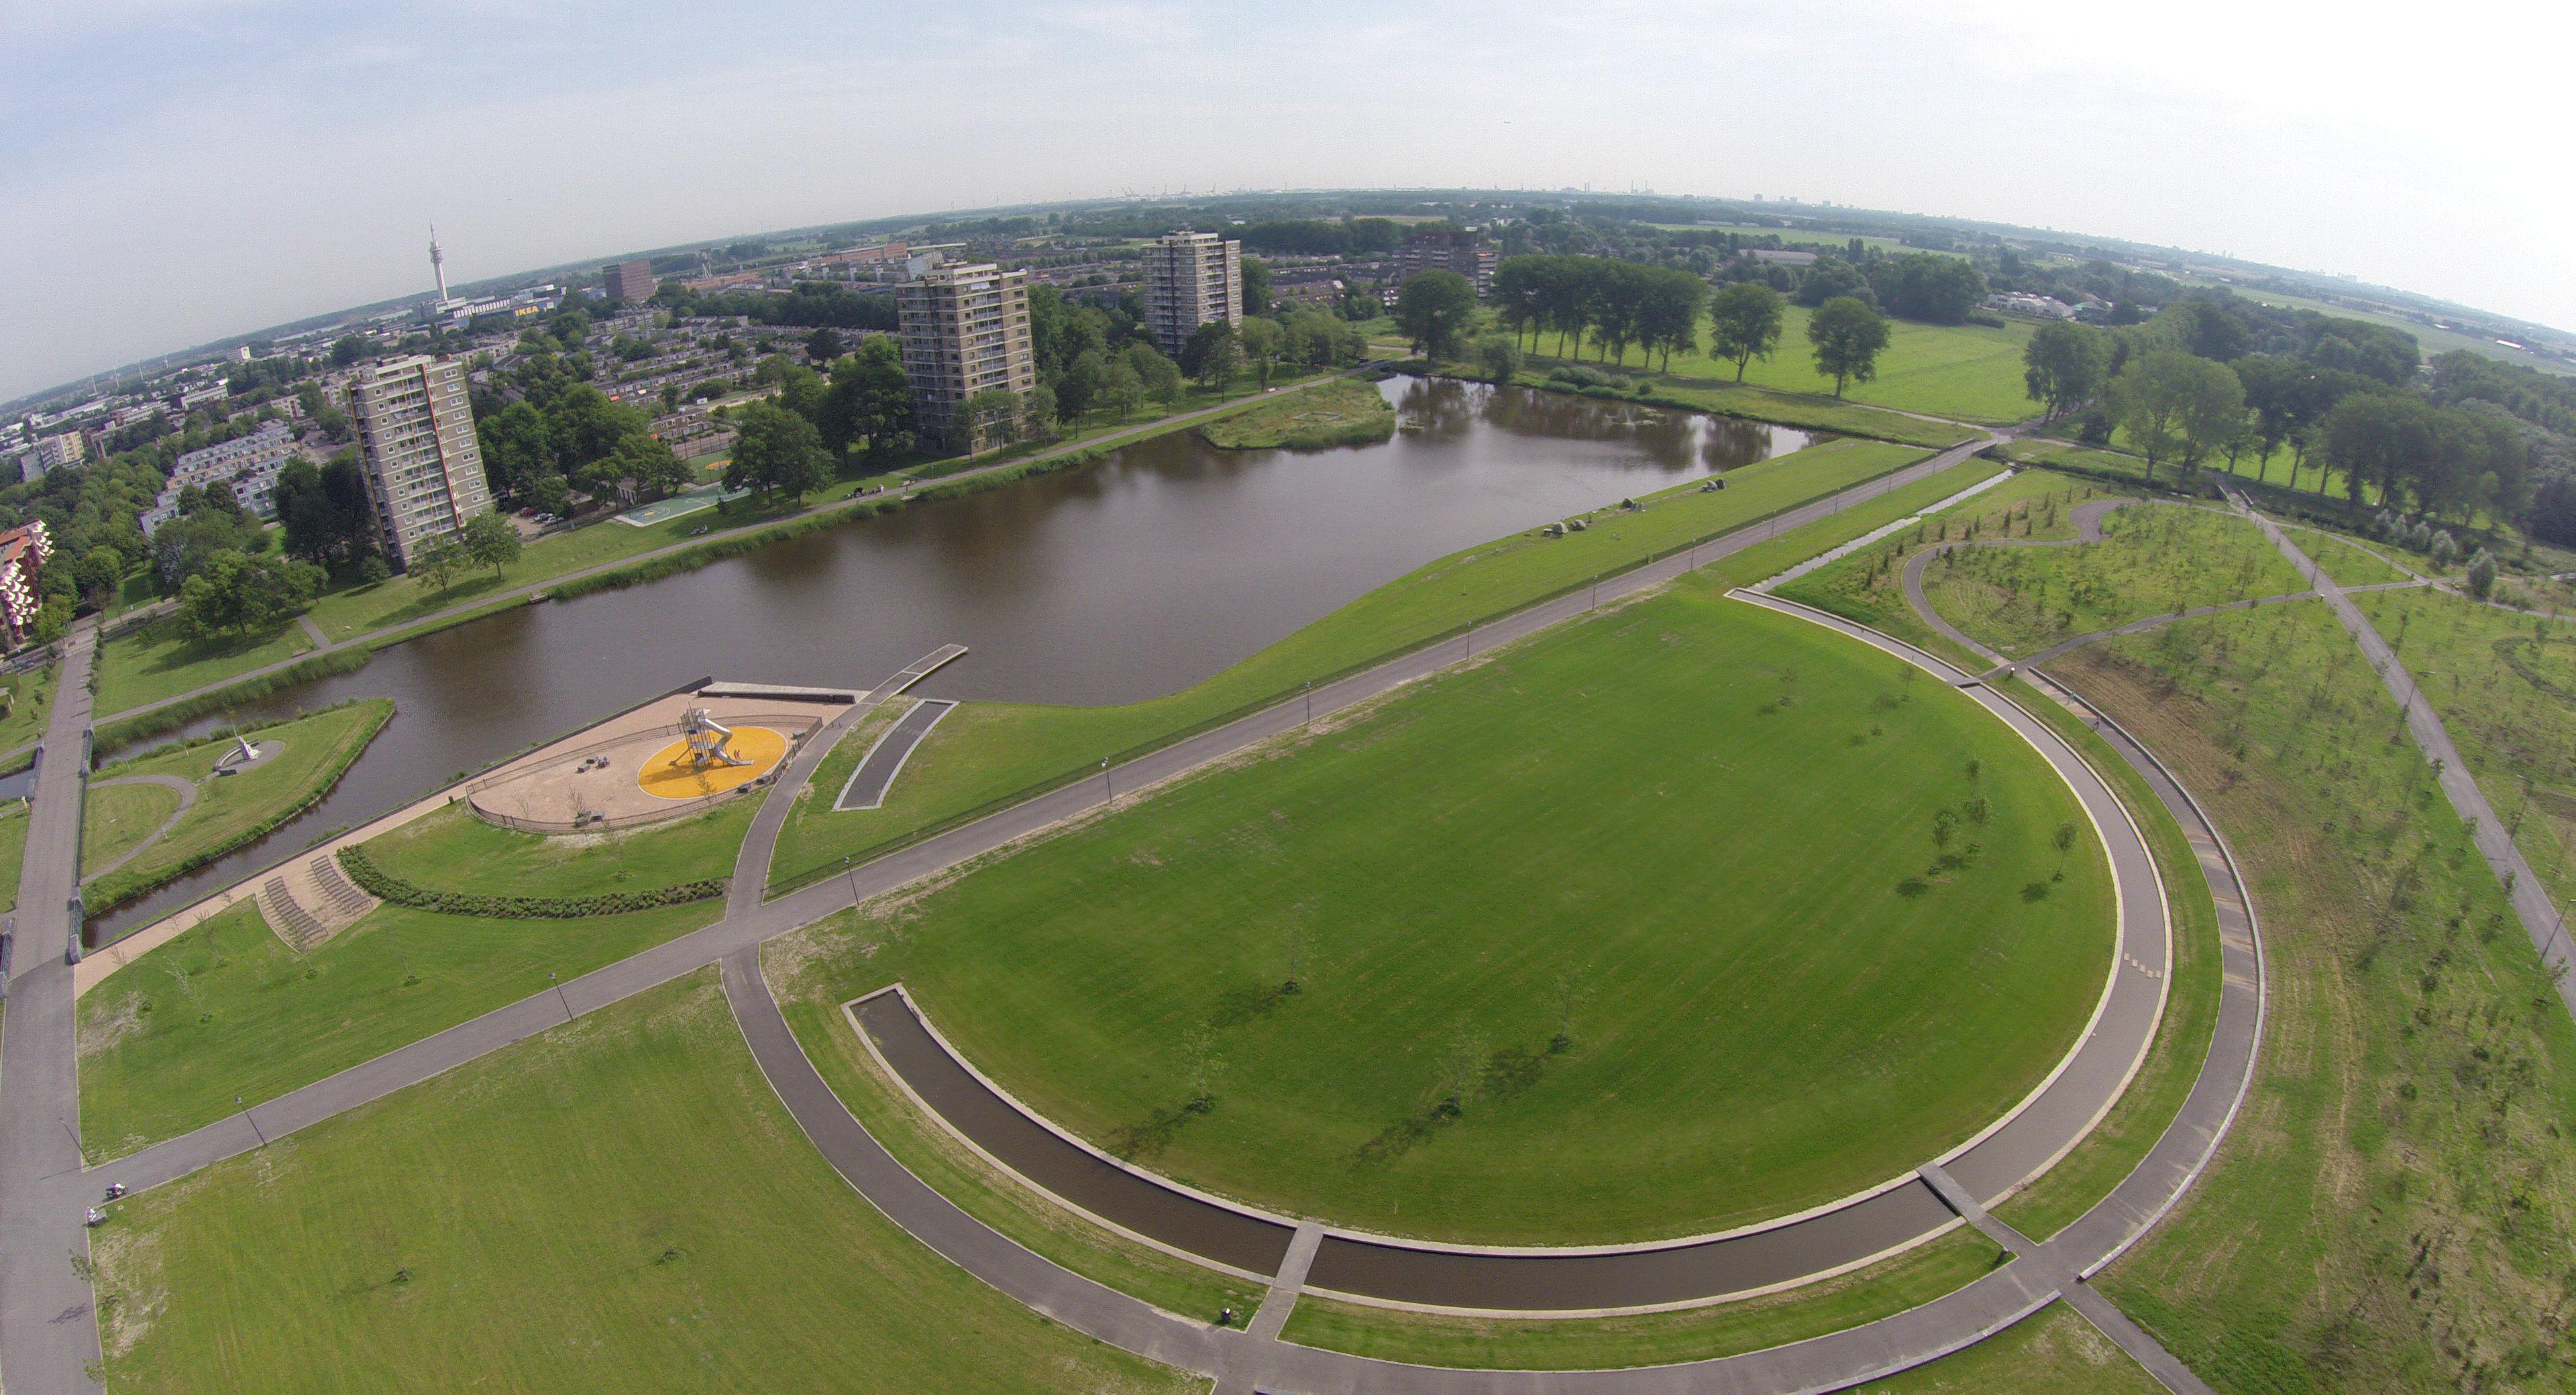 Reinalda Park, Parkwijk, Haarlem, The Netherlands